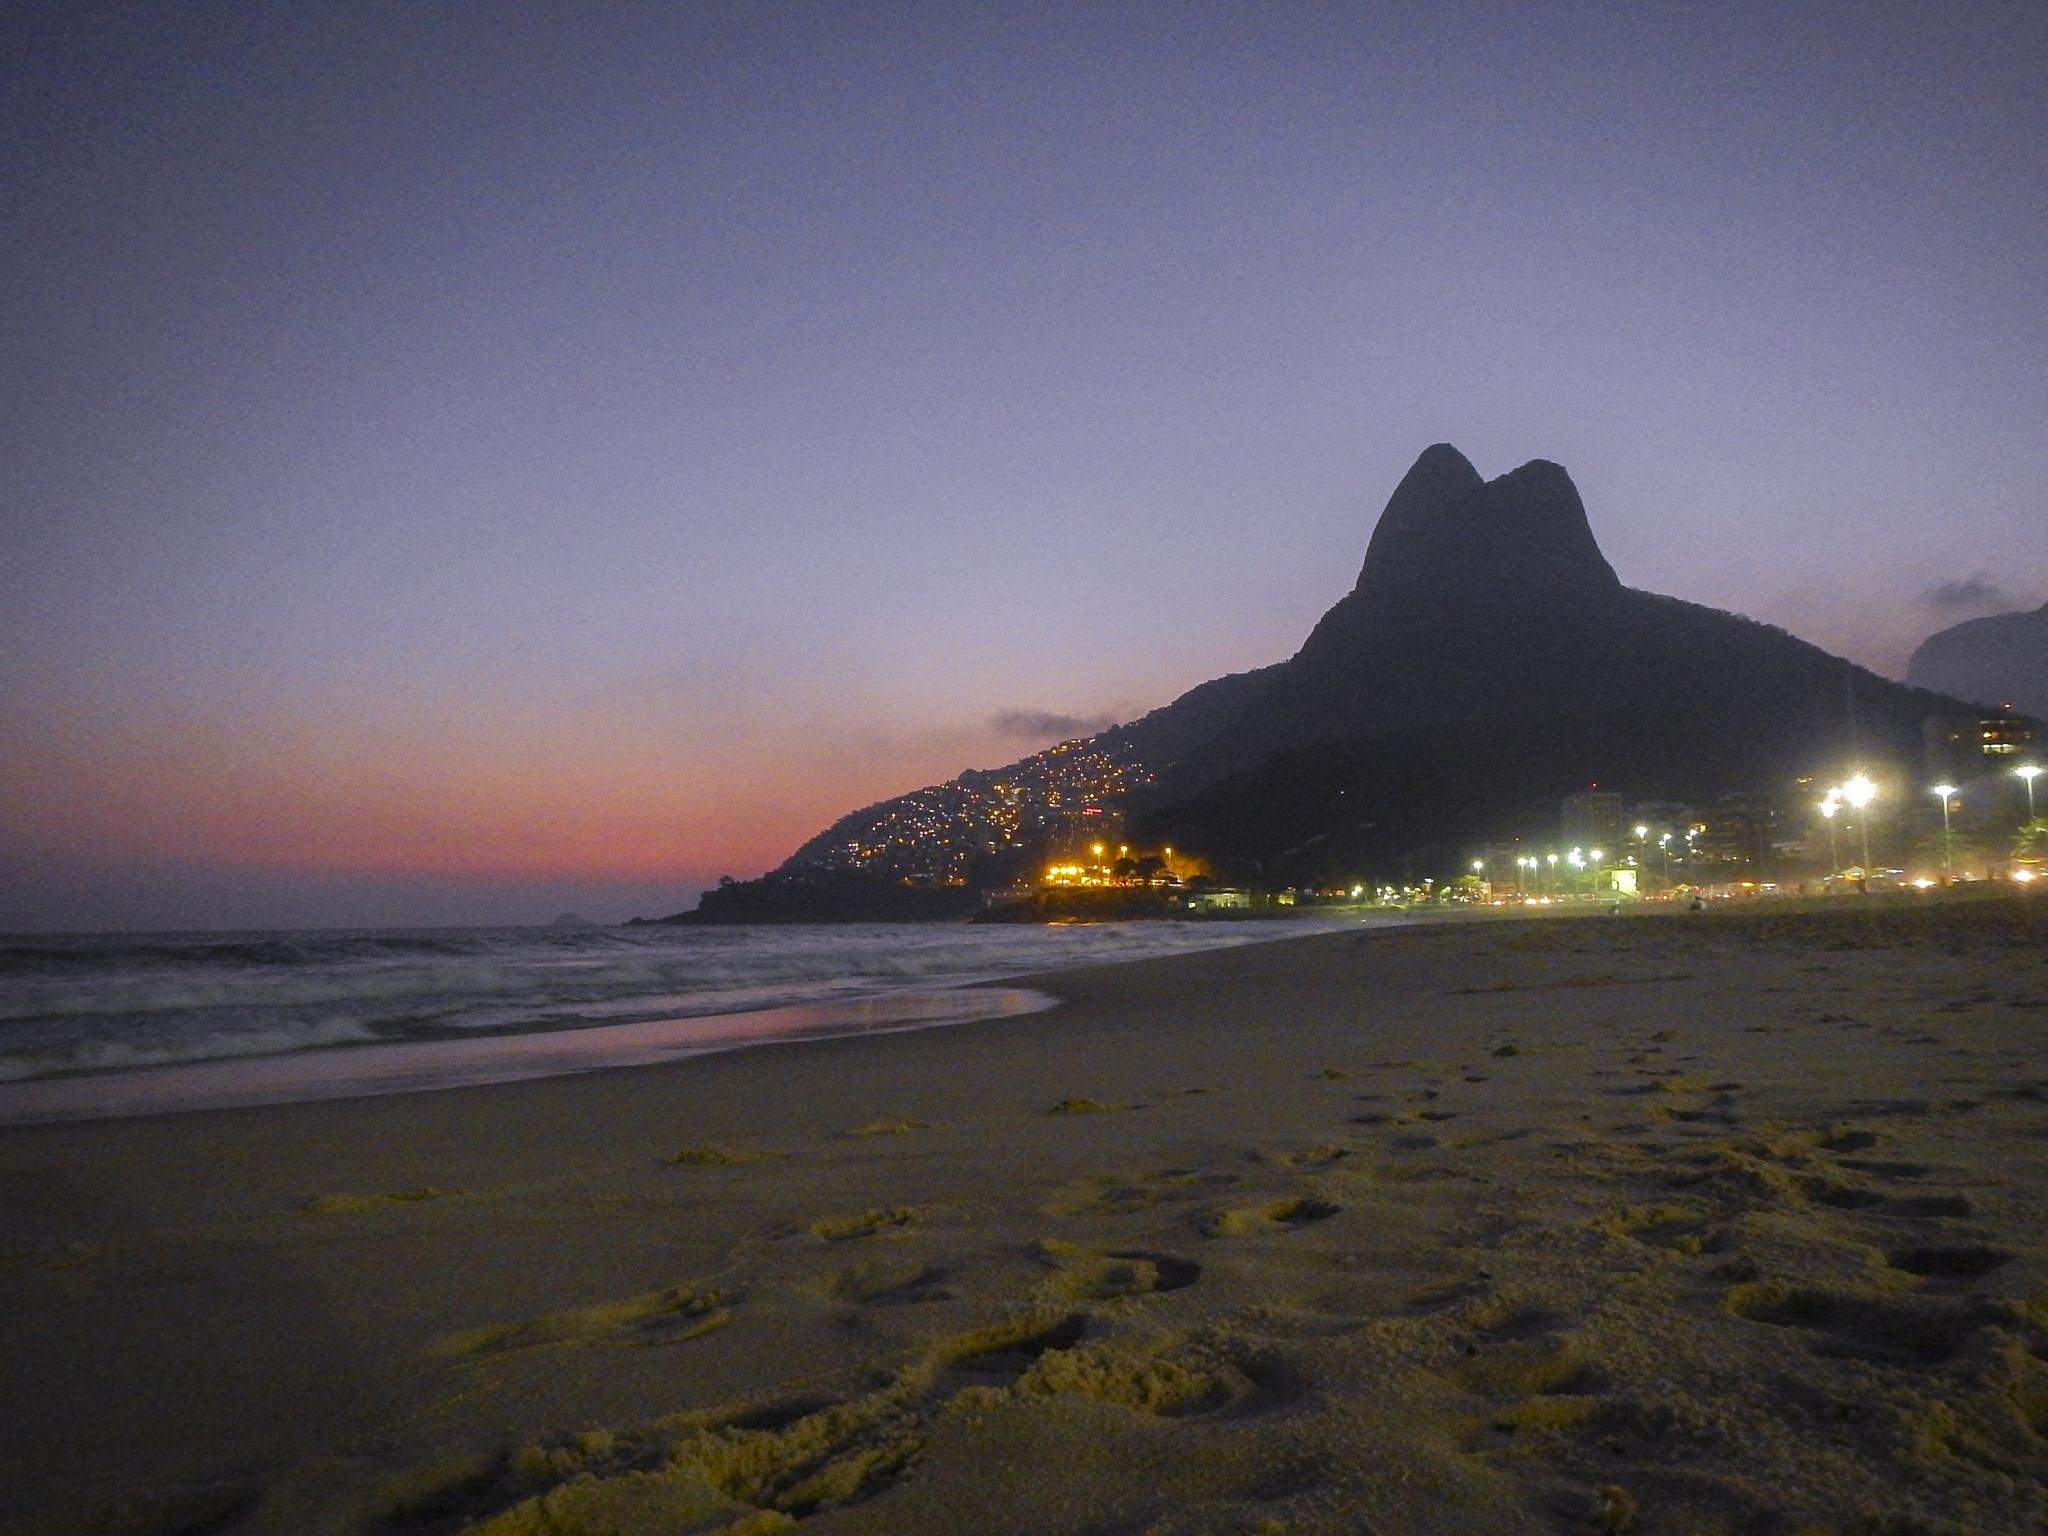 Leblon sunset by Marcelo Zal Riani